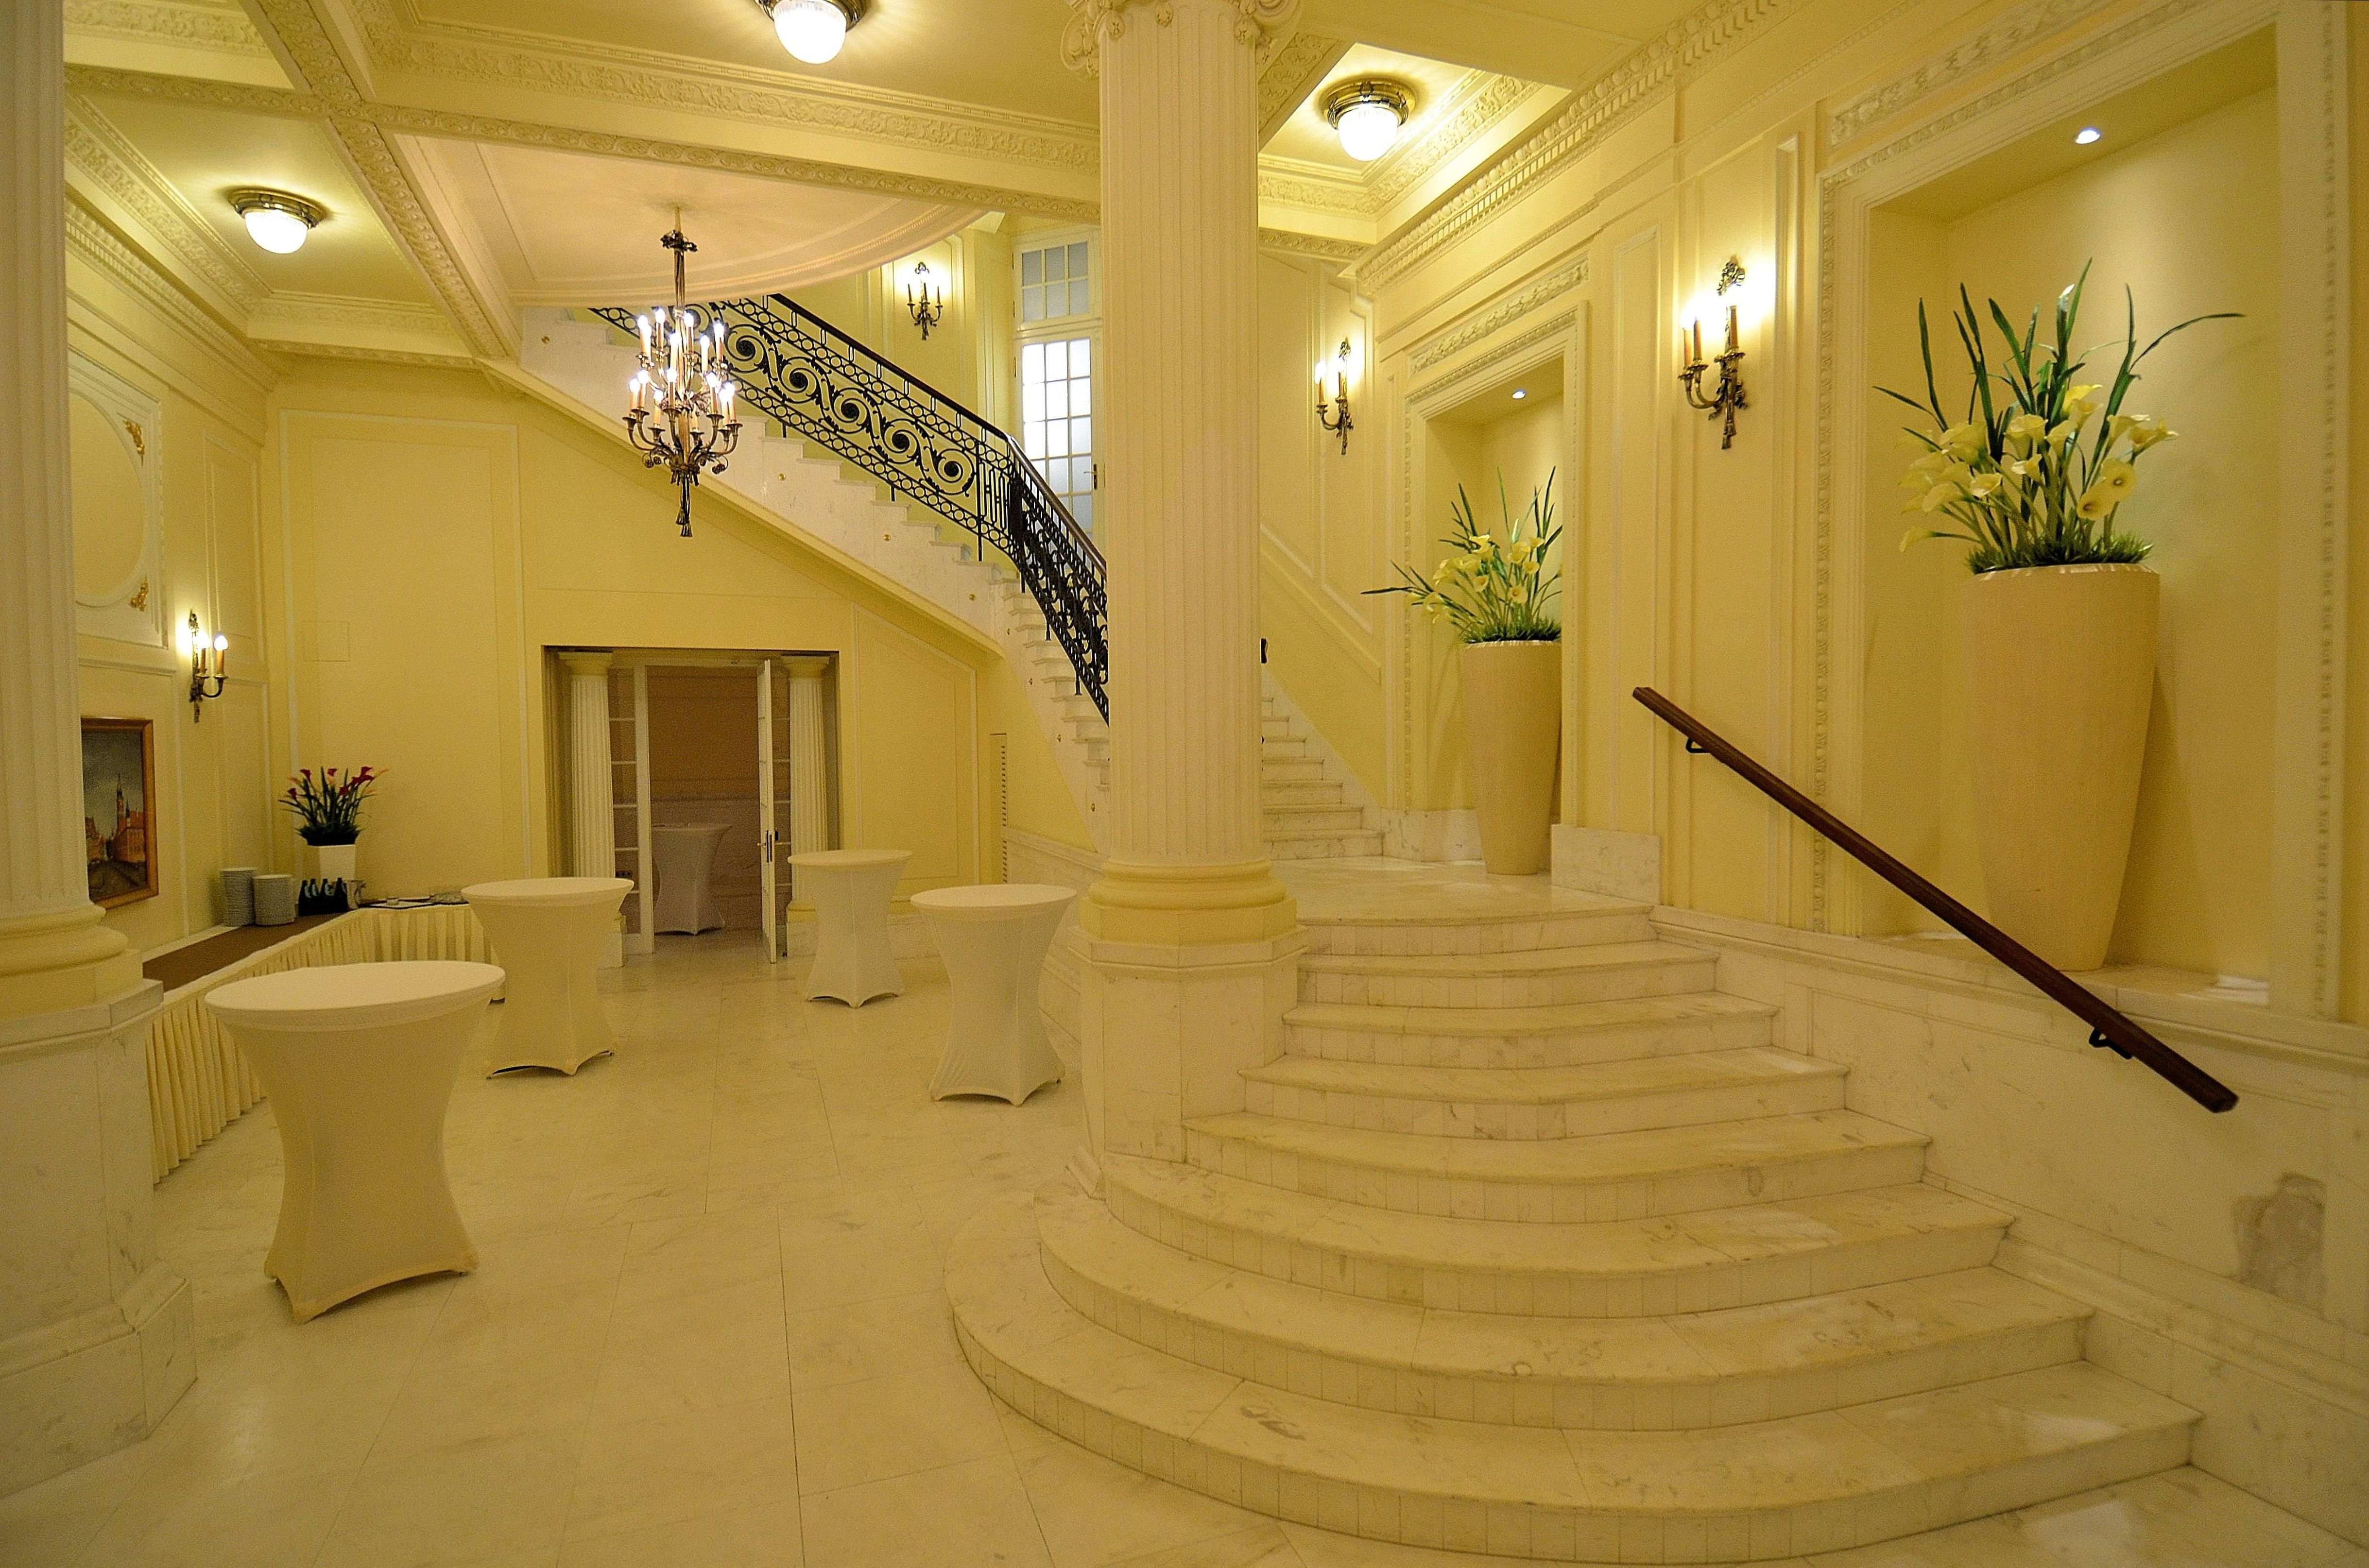 file foyer sala ludwikowska hotel polonia warszawa jpg wikimedia commons. Black Bedroom Furniture Sets. Home Design Ideas